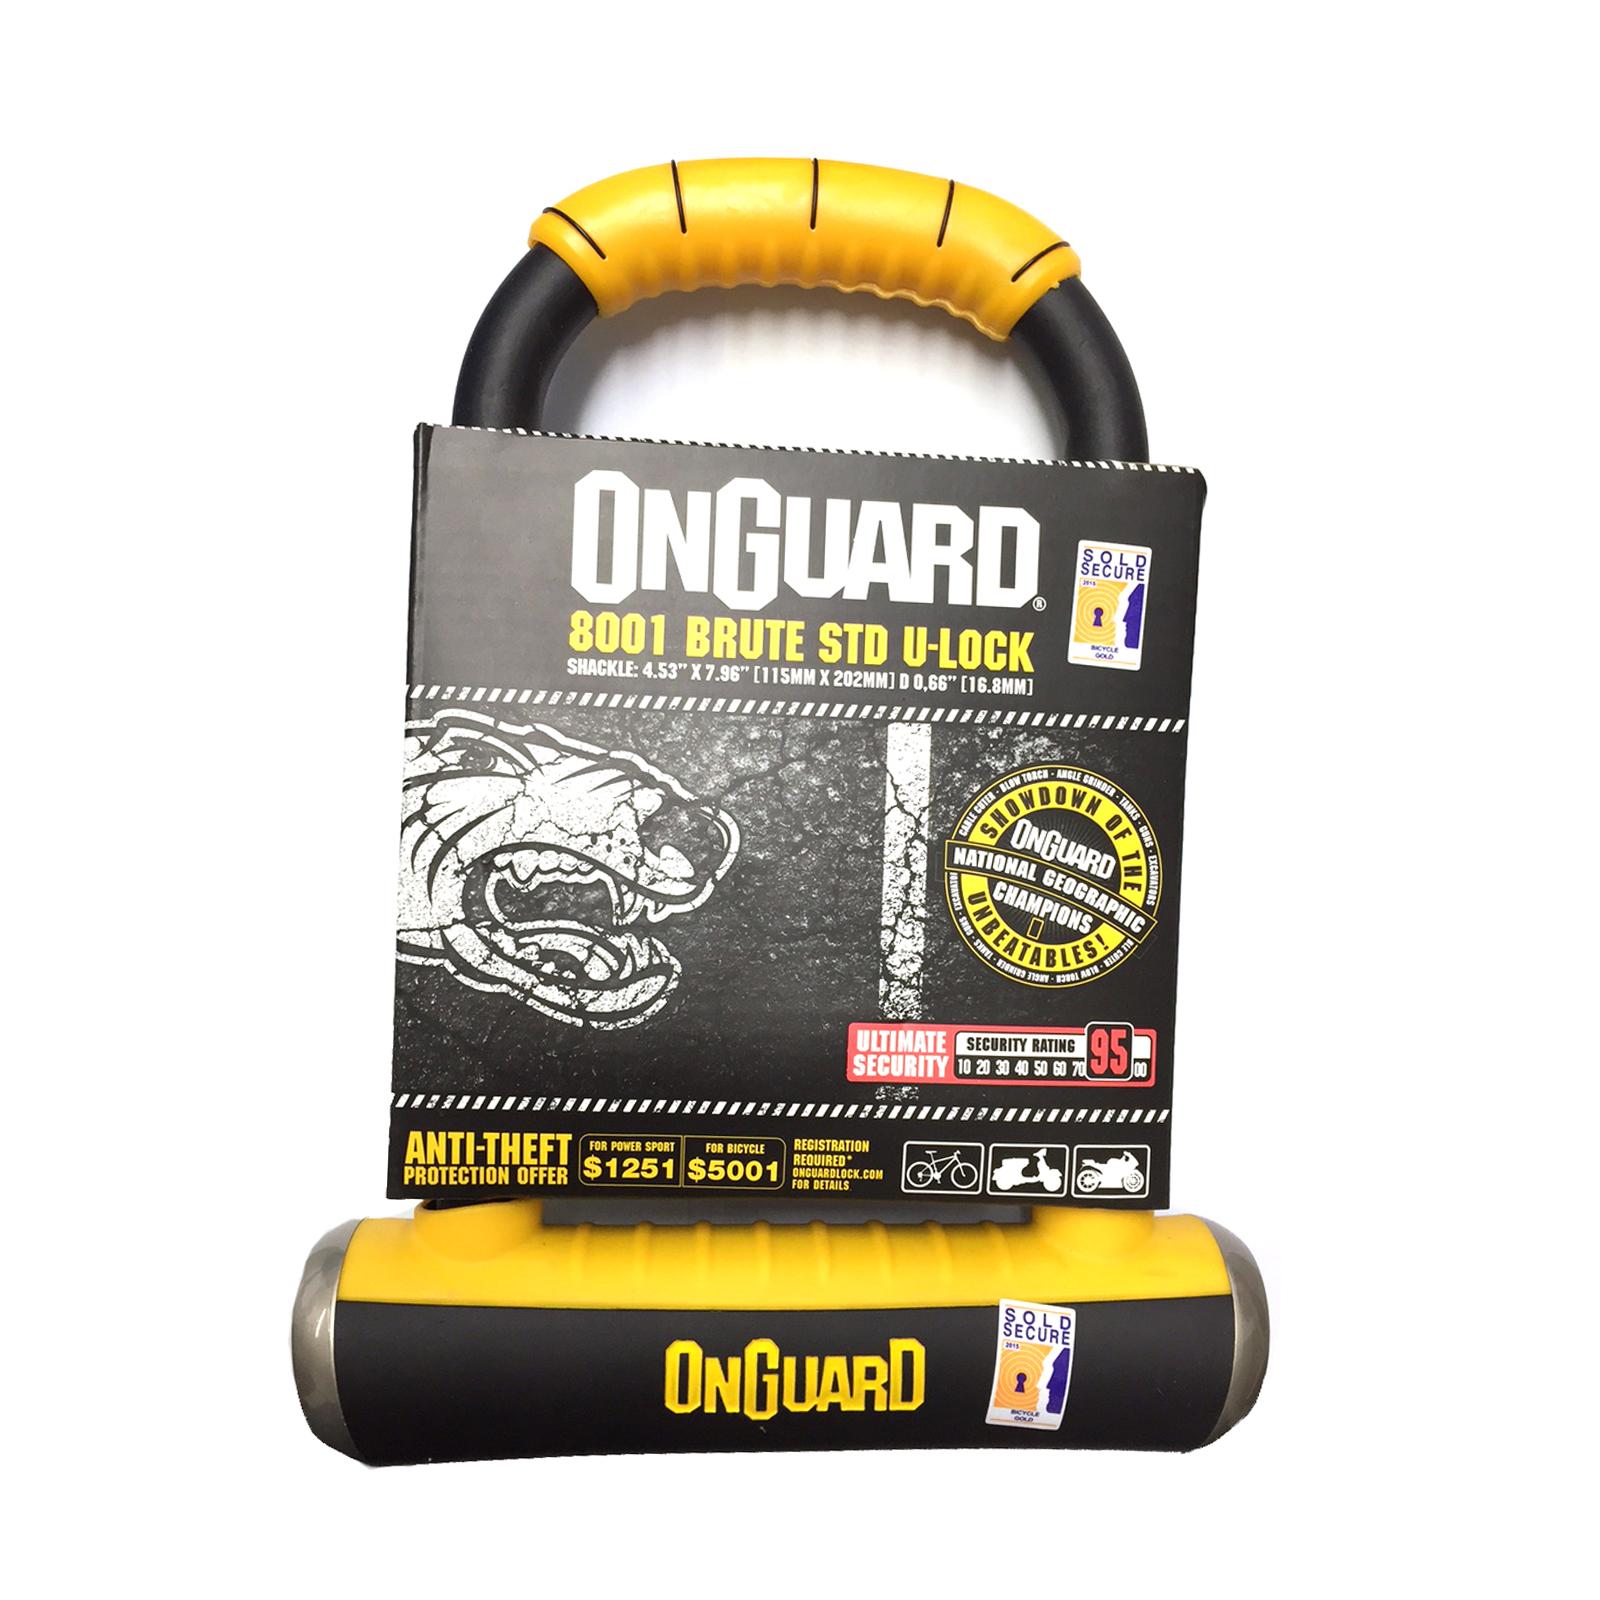 ONGUARD Brute Standard 8001 anti-vol Moto Scooter Lock Or Vendu Sécurisé